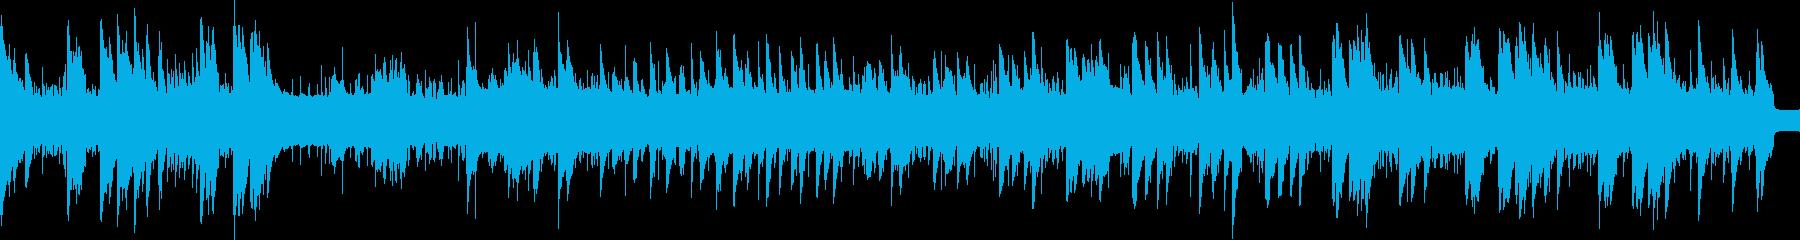 8bitスペースファンタジー 1コーラスの再生済みの波形